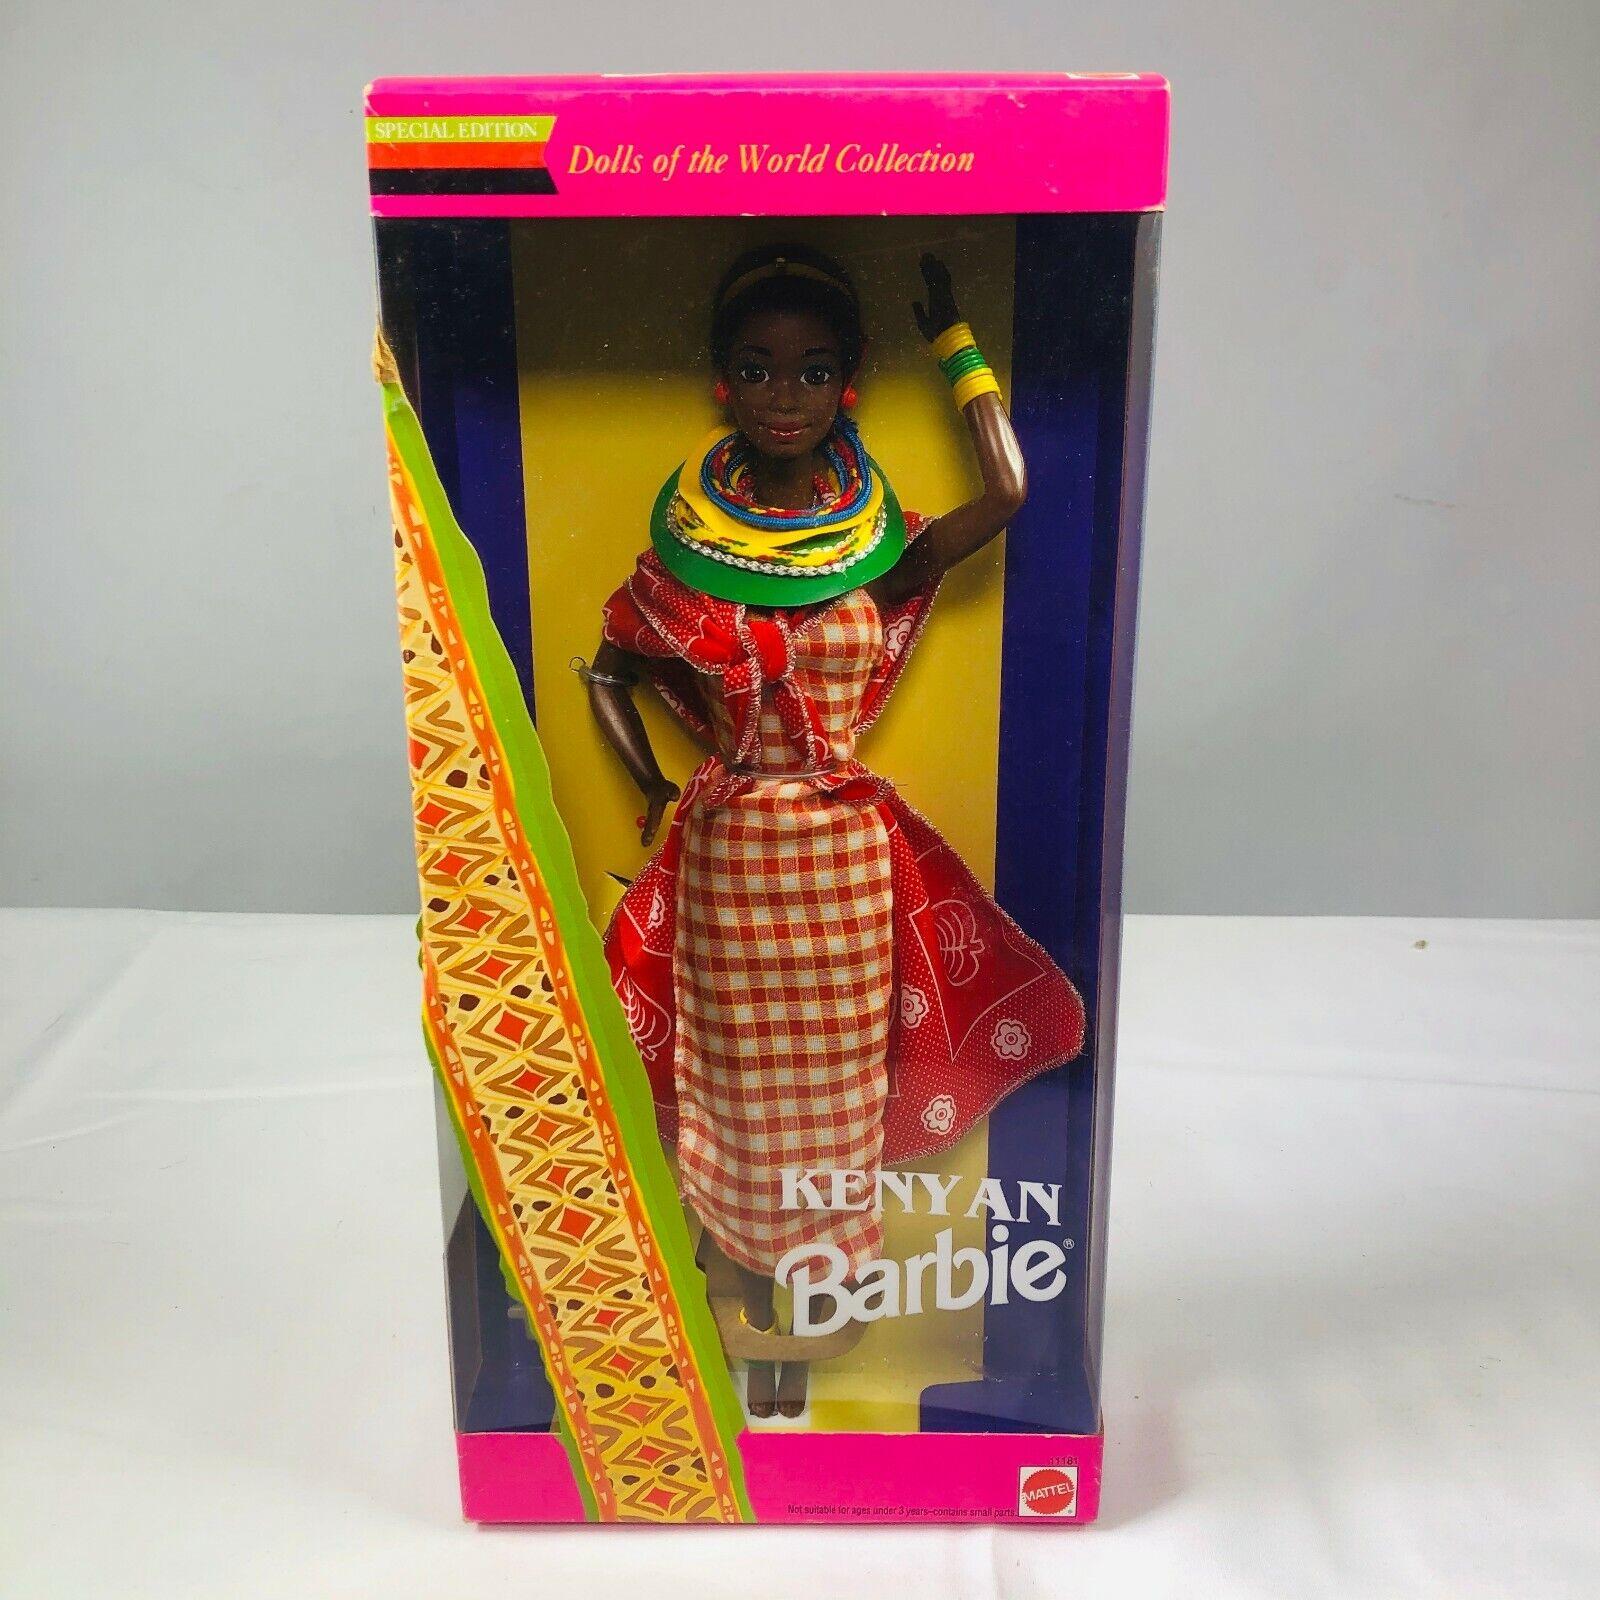 VINTAGE 1993 Mattel Kenyan BARBIE Limited Edition Dolls of the World Collection